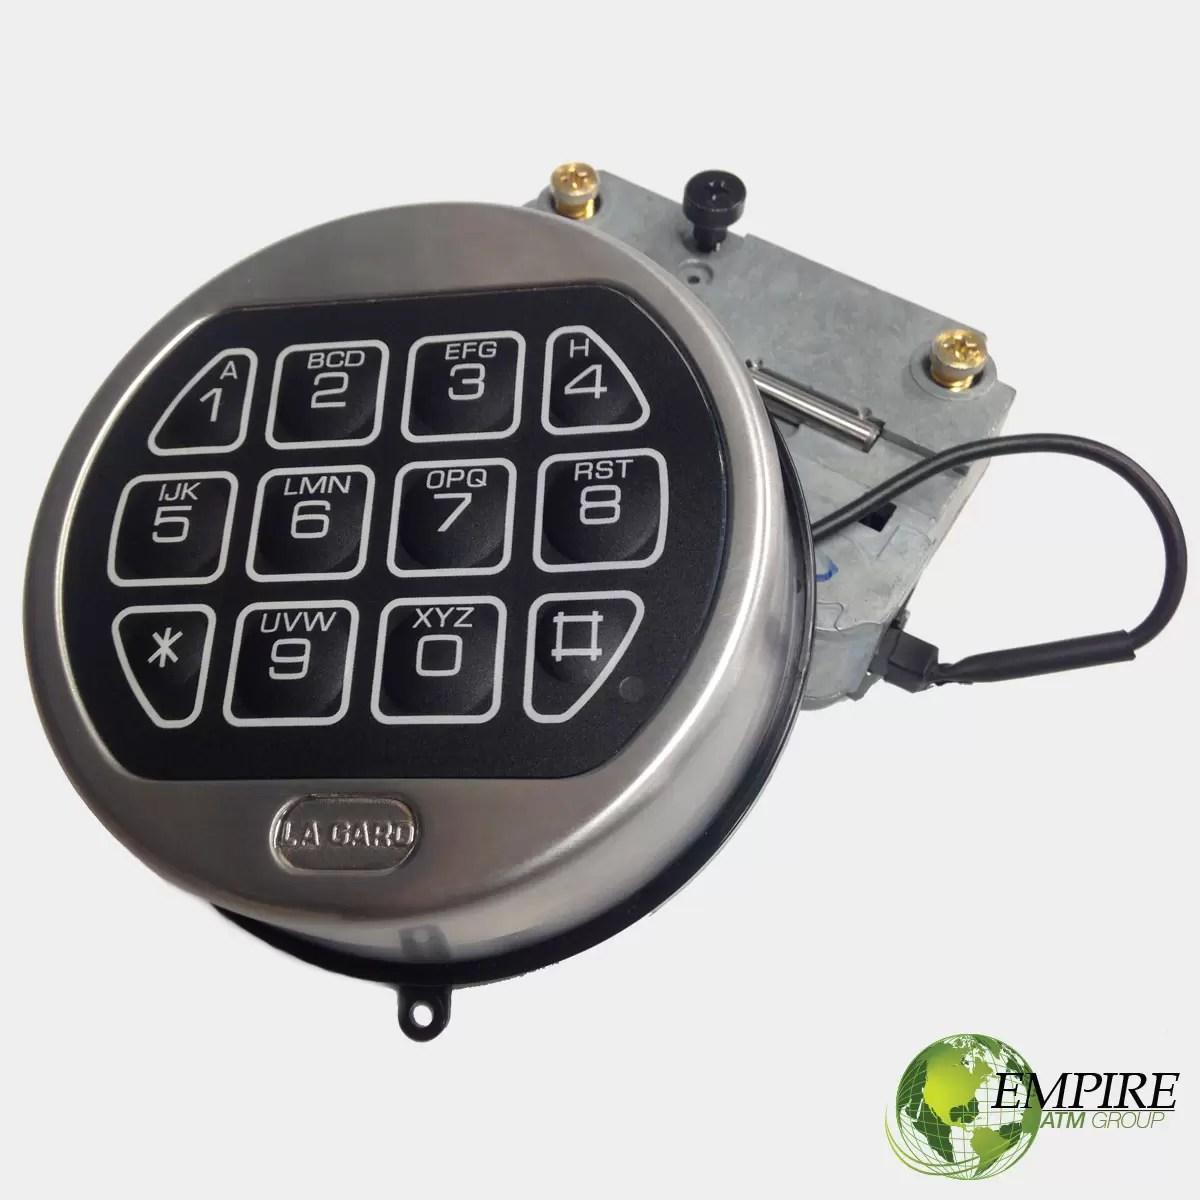 Atm Shield Keypad Empire Atm Group